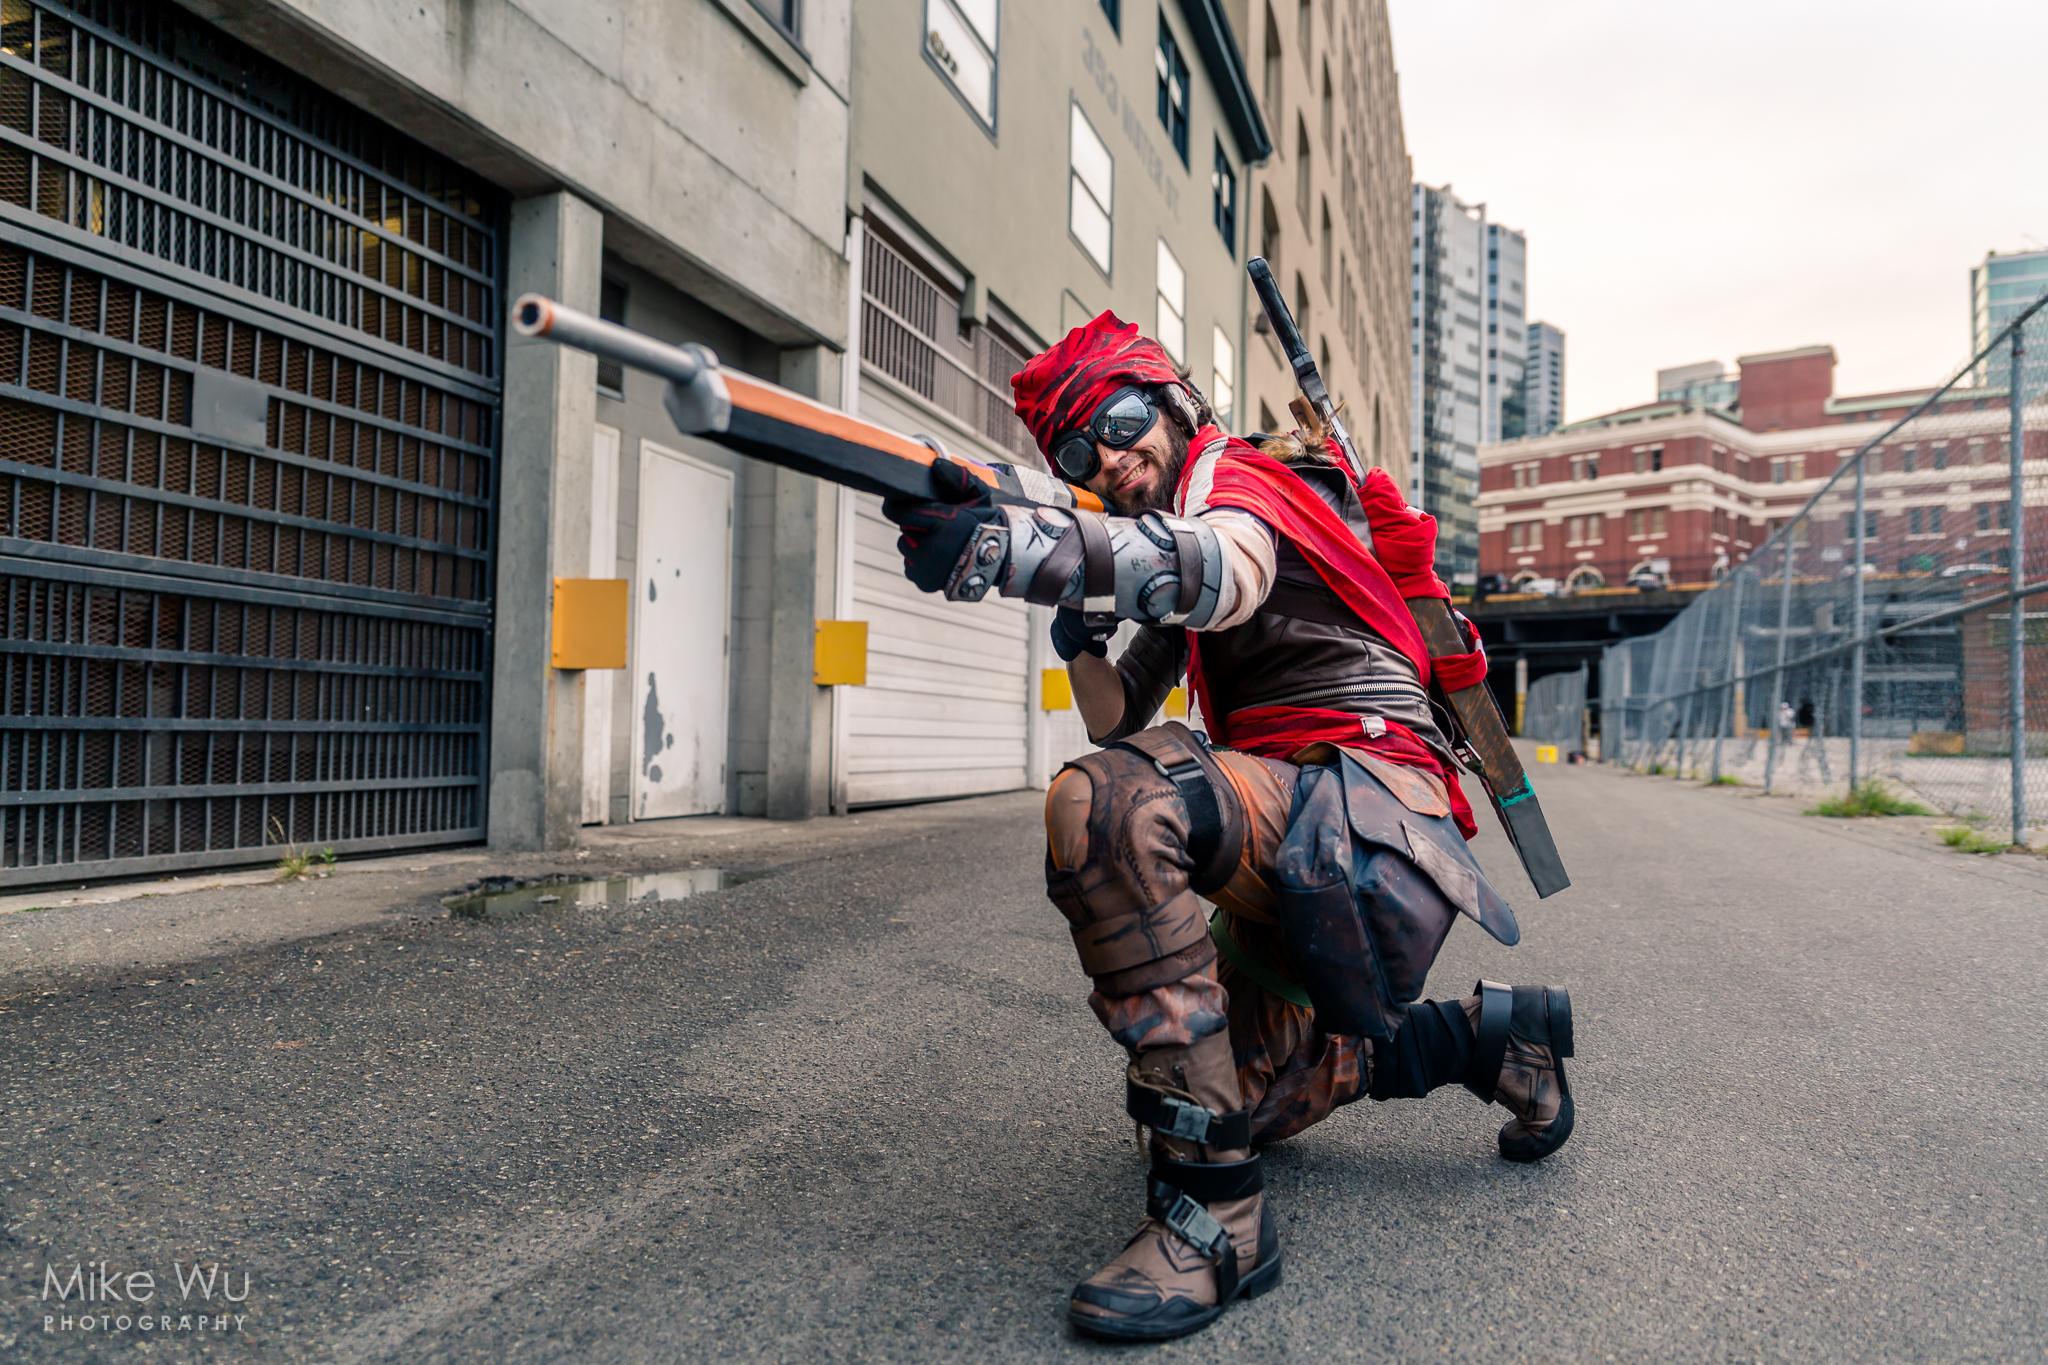 cosplay, moridcai, borderlands, rifle, man, shoot, game